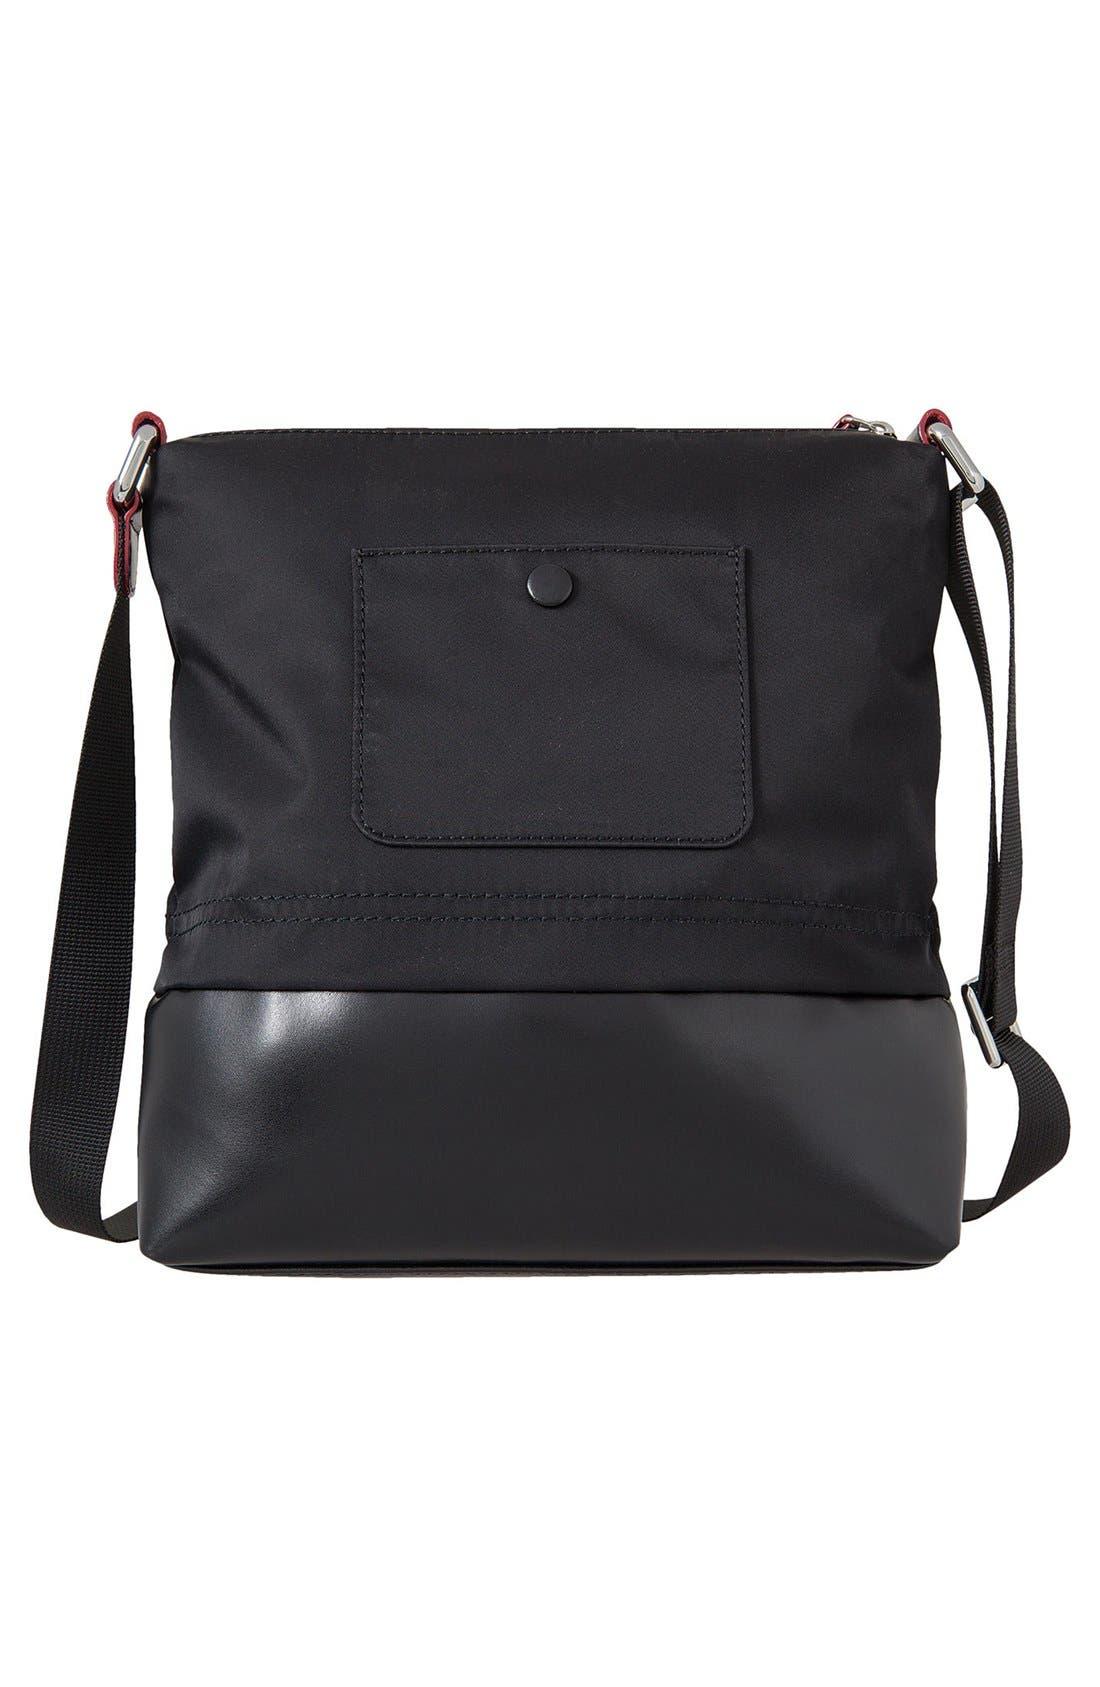 Wanda RFID Nylon & Leather Crossbody Bag,                             Alternate thumbnail 2, color,                             Black